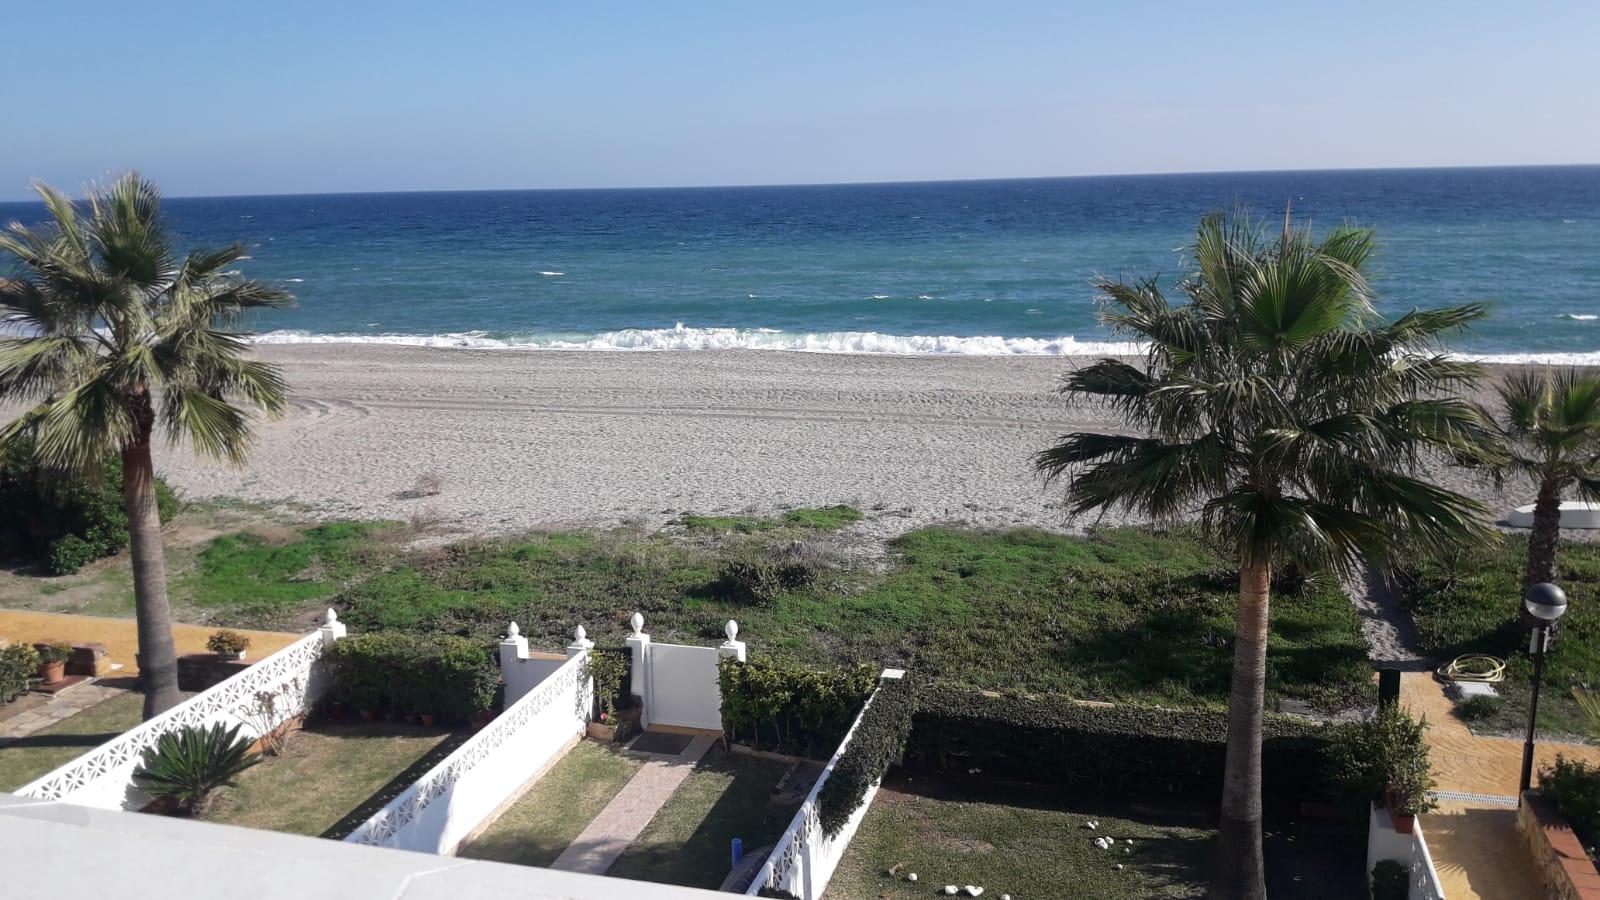 Adosada Primera Playa Paraiso Manilva